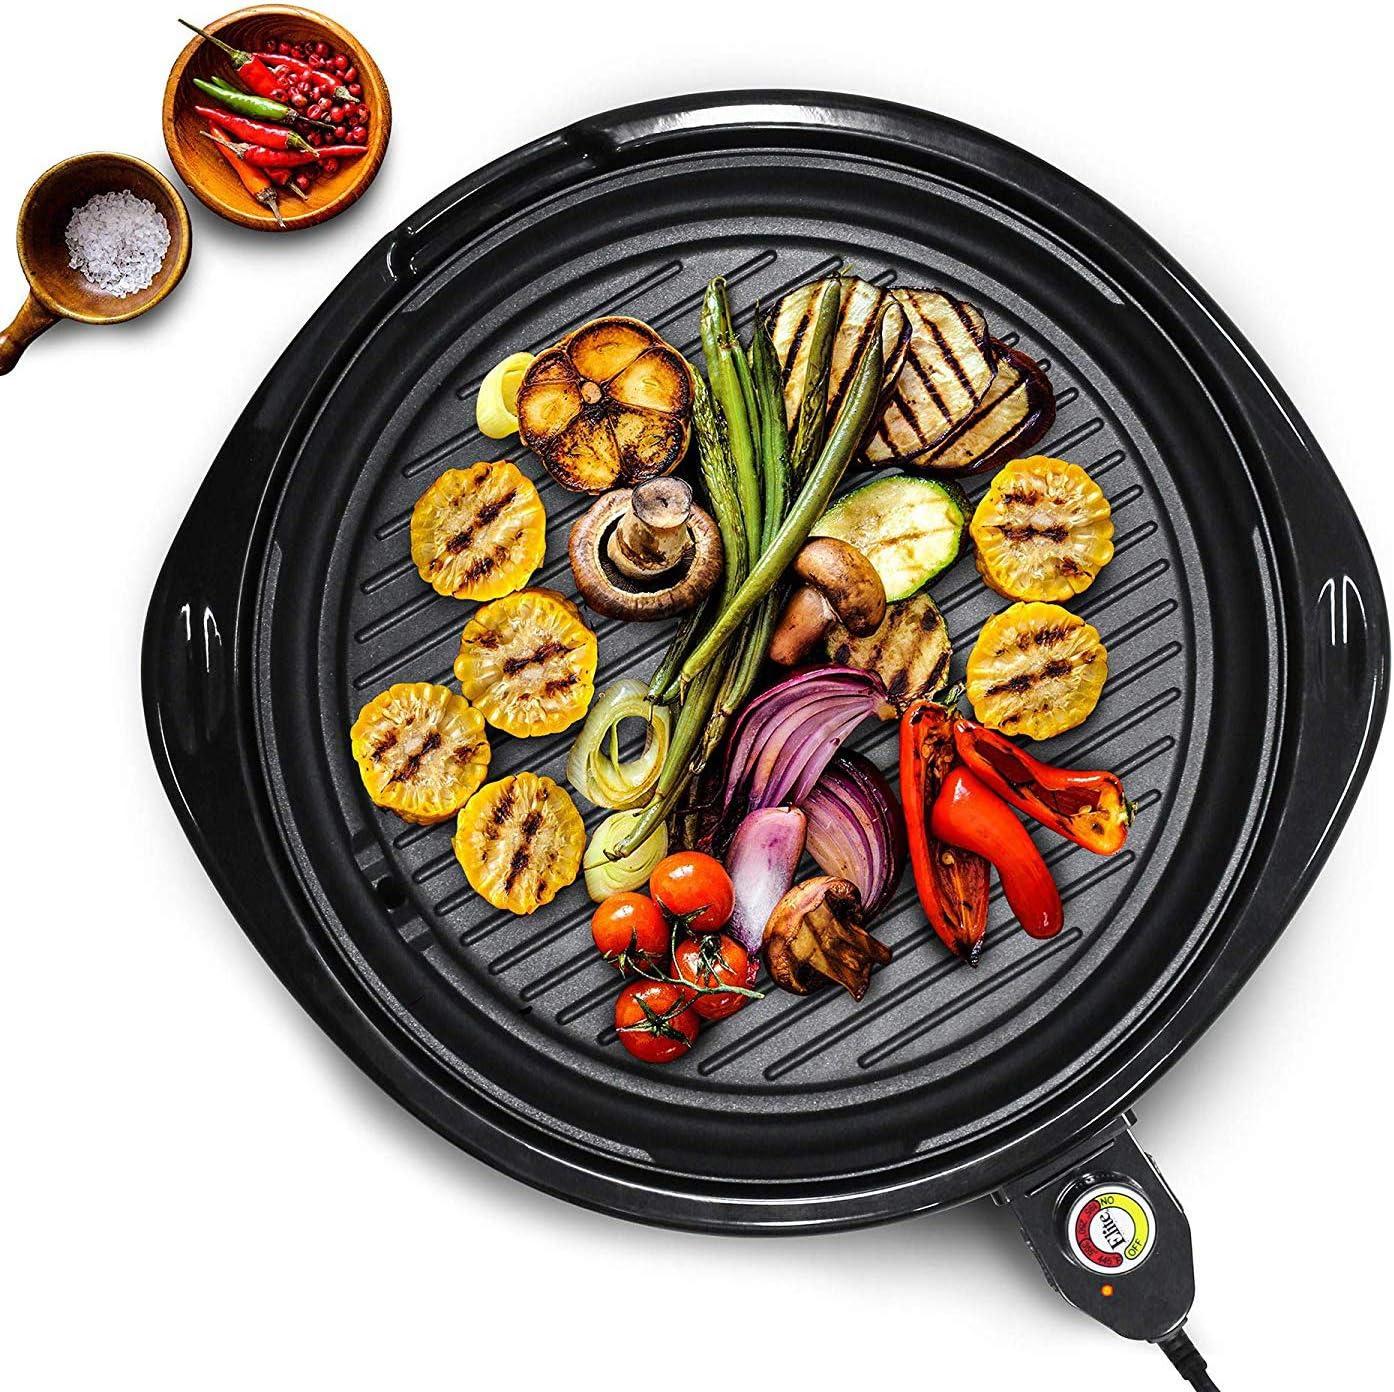 Korean bbq grill - Premium Electric Grill: Maxi-Matic EMG-980B Indoor Electric Grill Nonstick